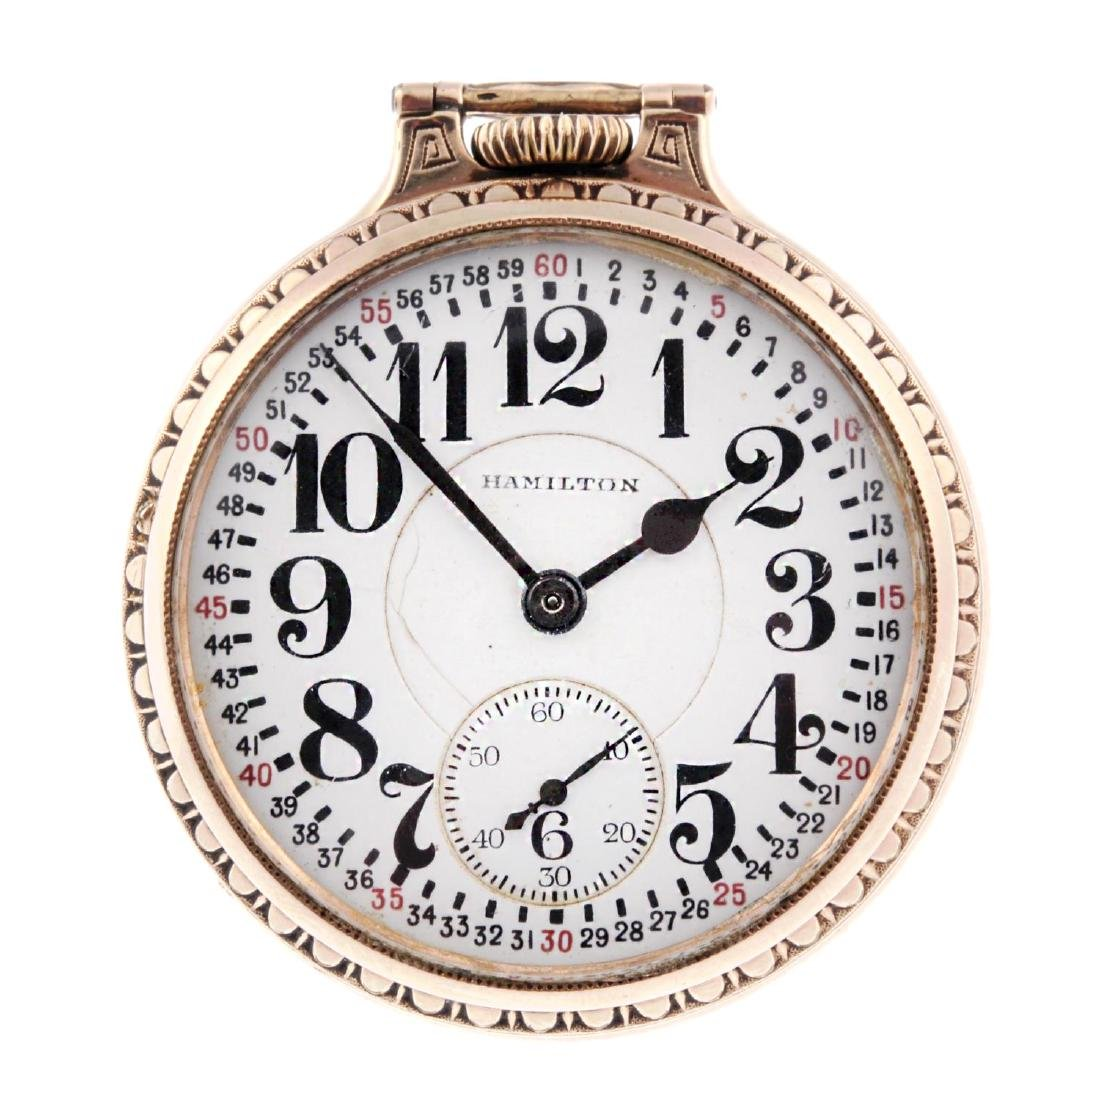 An open face railroad grade pocket watch by Hamilton.